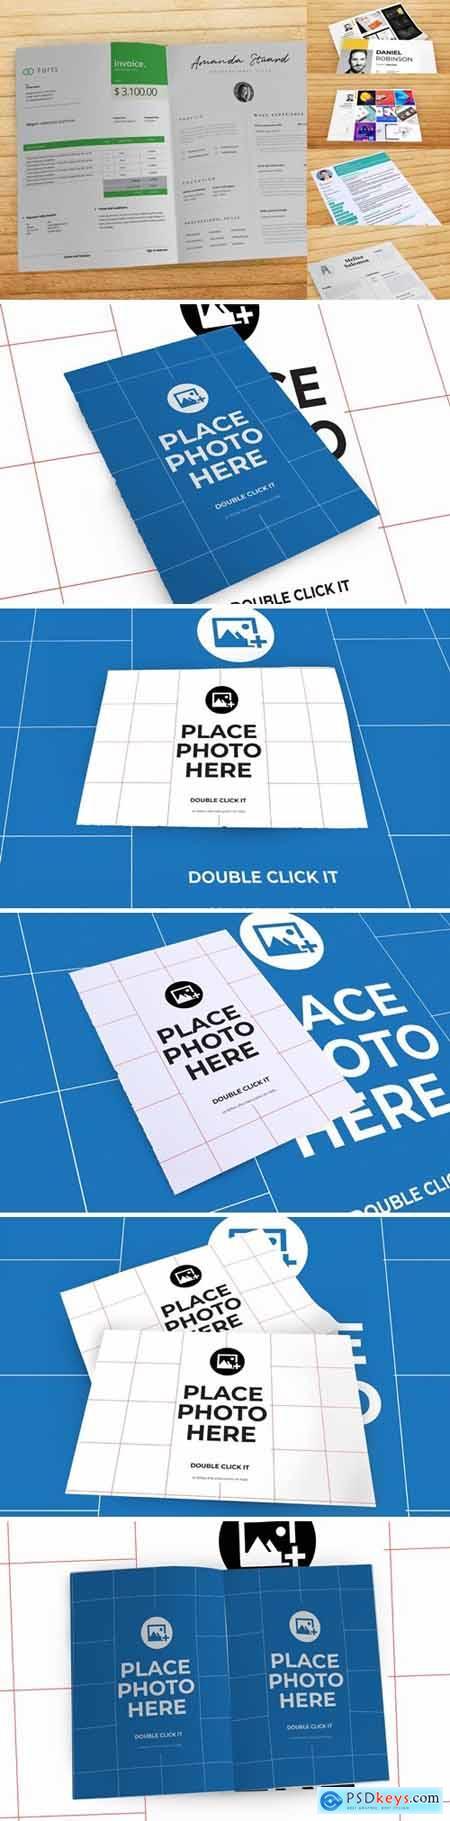 Cd Paper Realistic Mockup